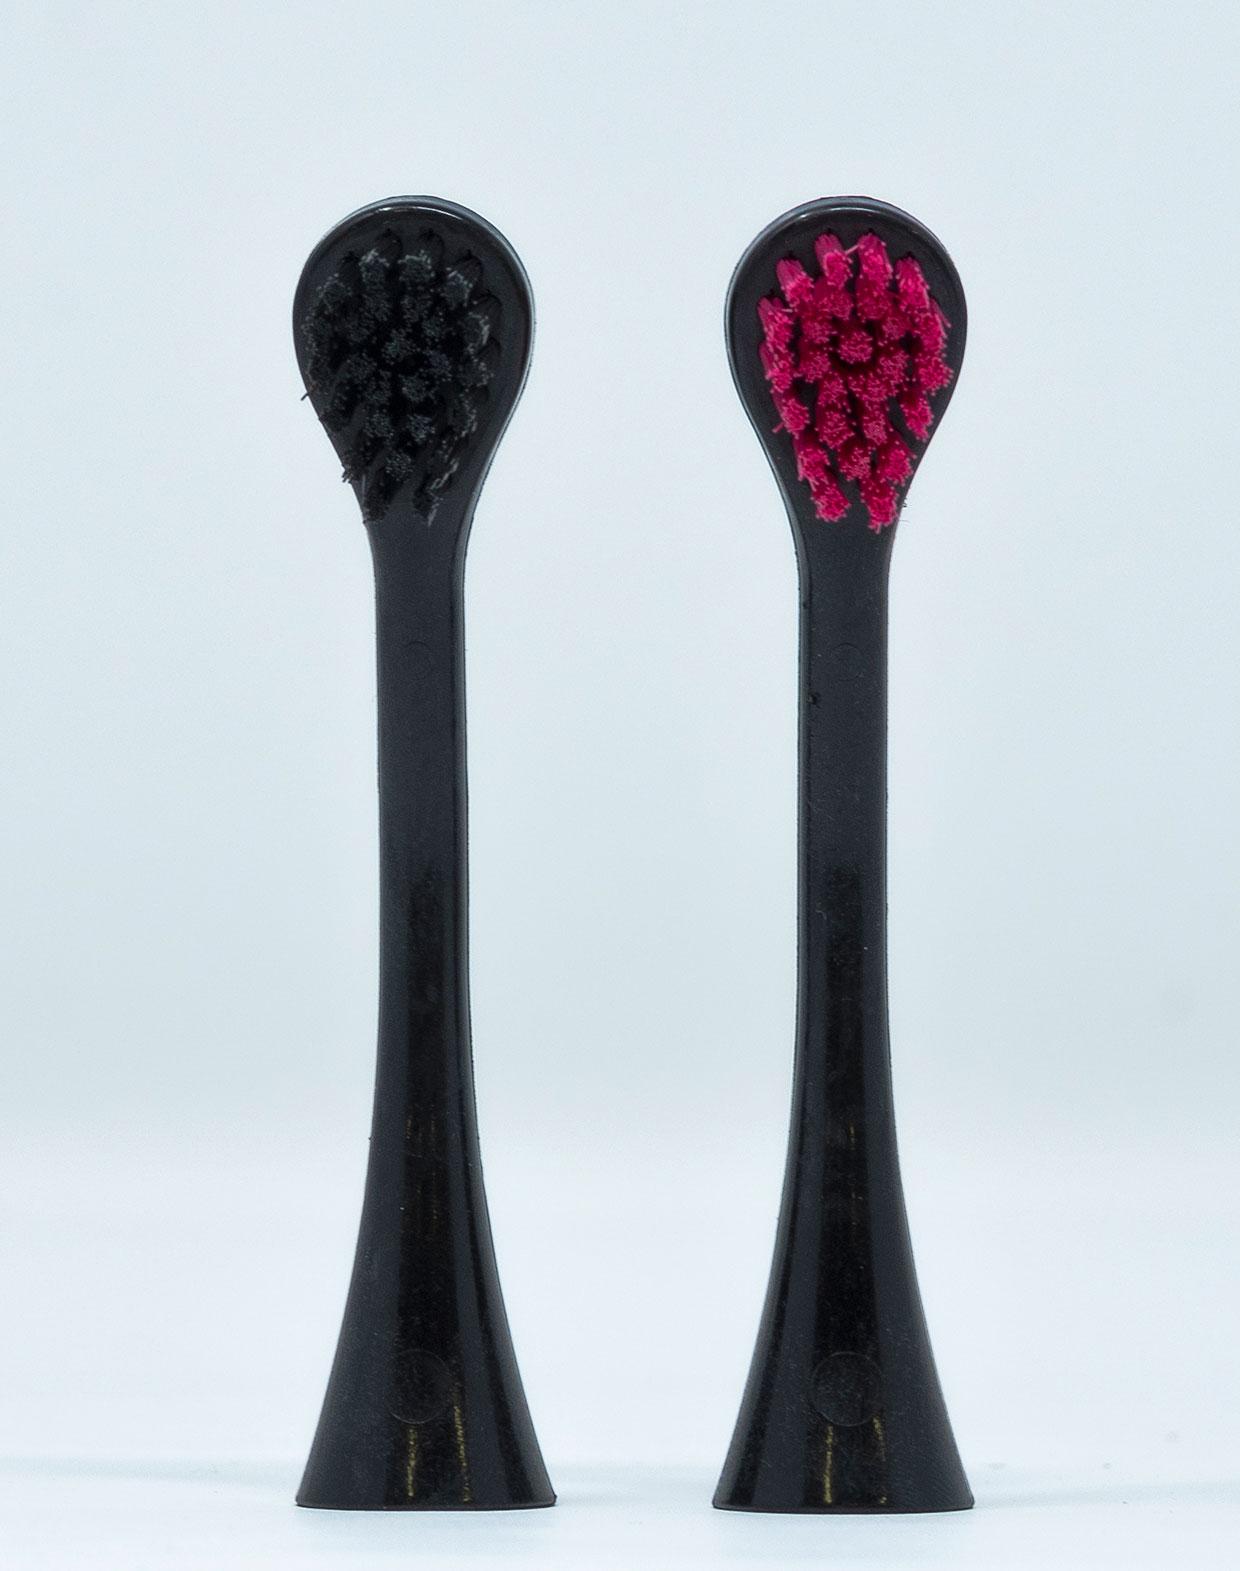 Curaprox Testina di Ricambio BIW 259 Smart Duo – 2 pz